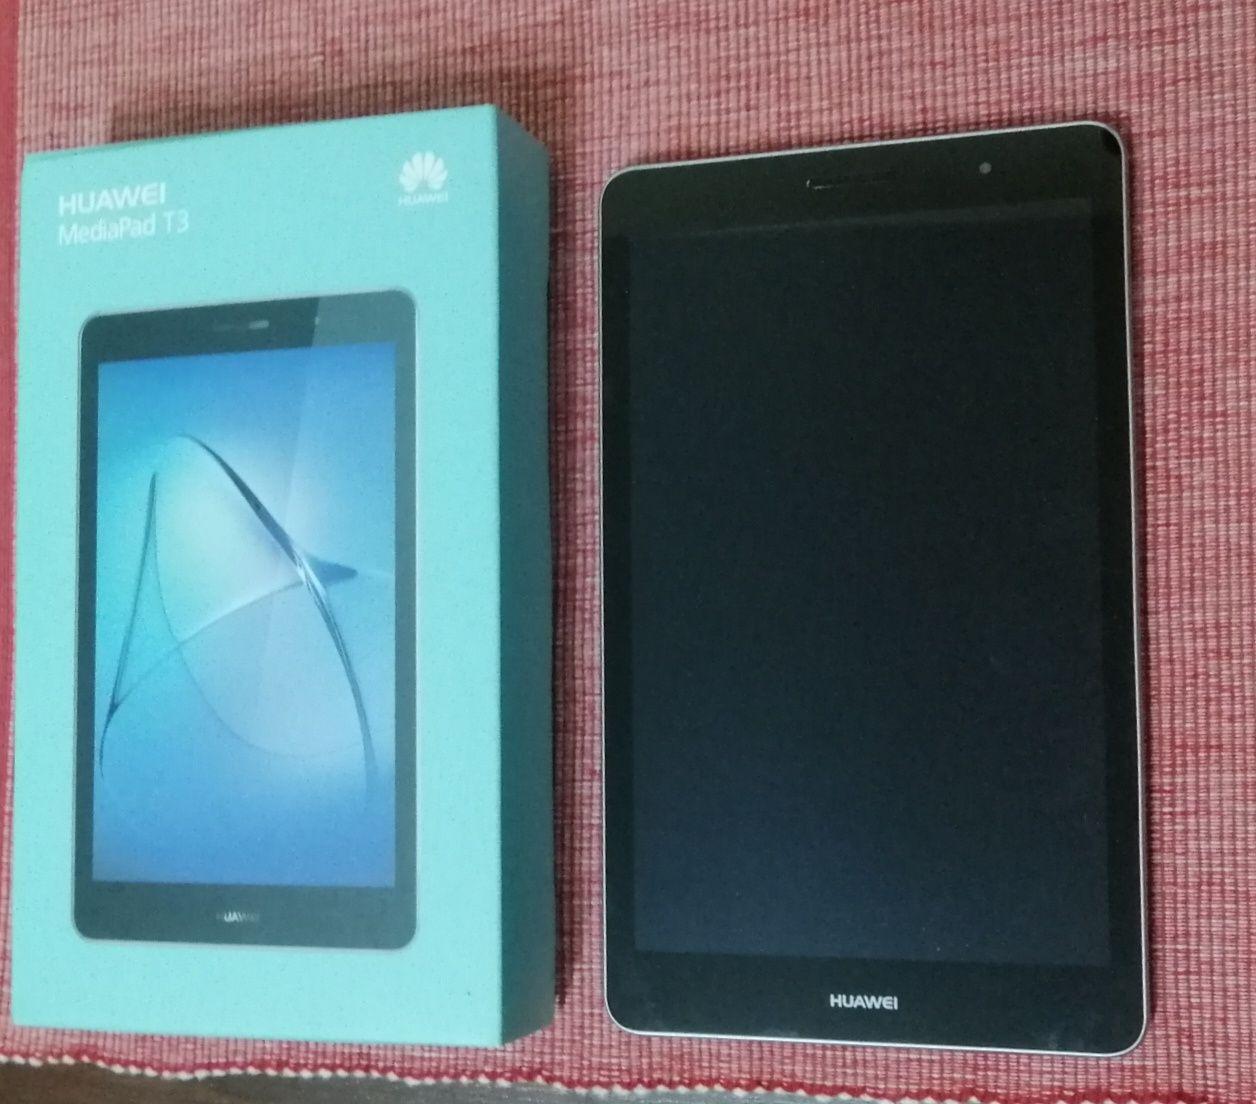 Huawei MediaPad T3 8 inch